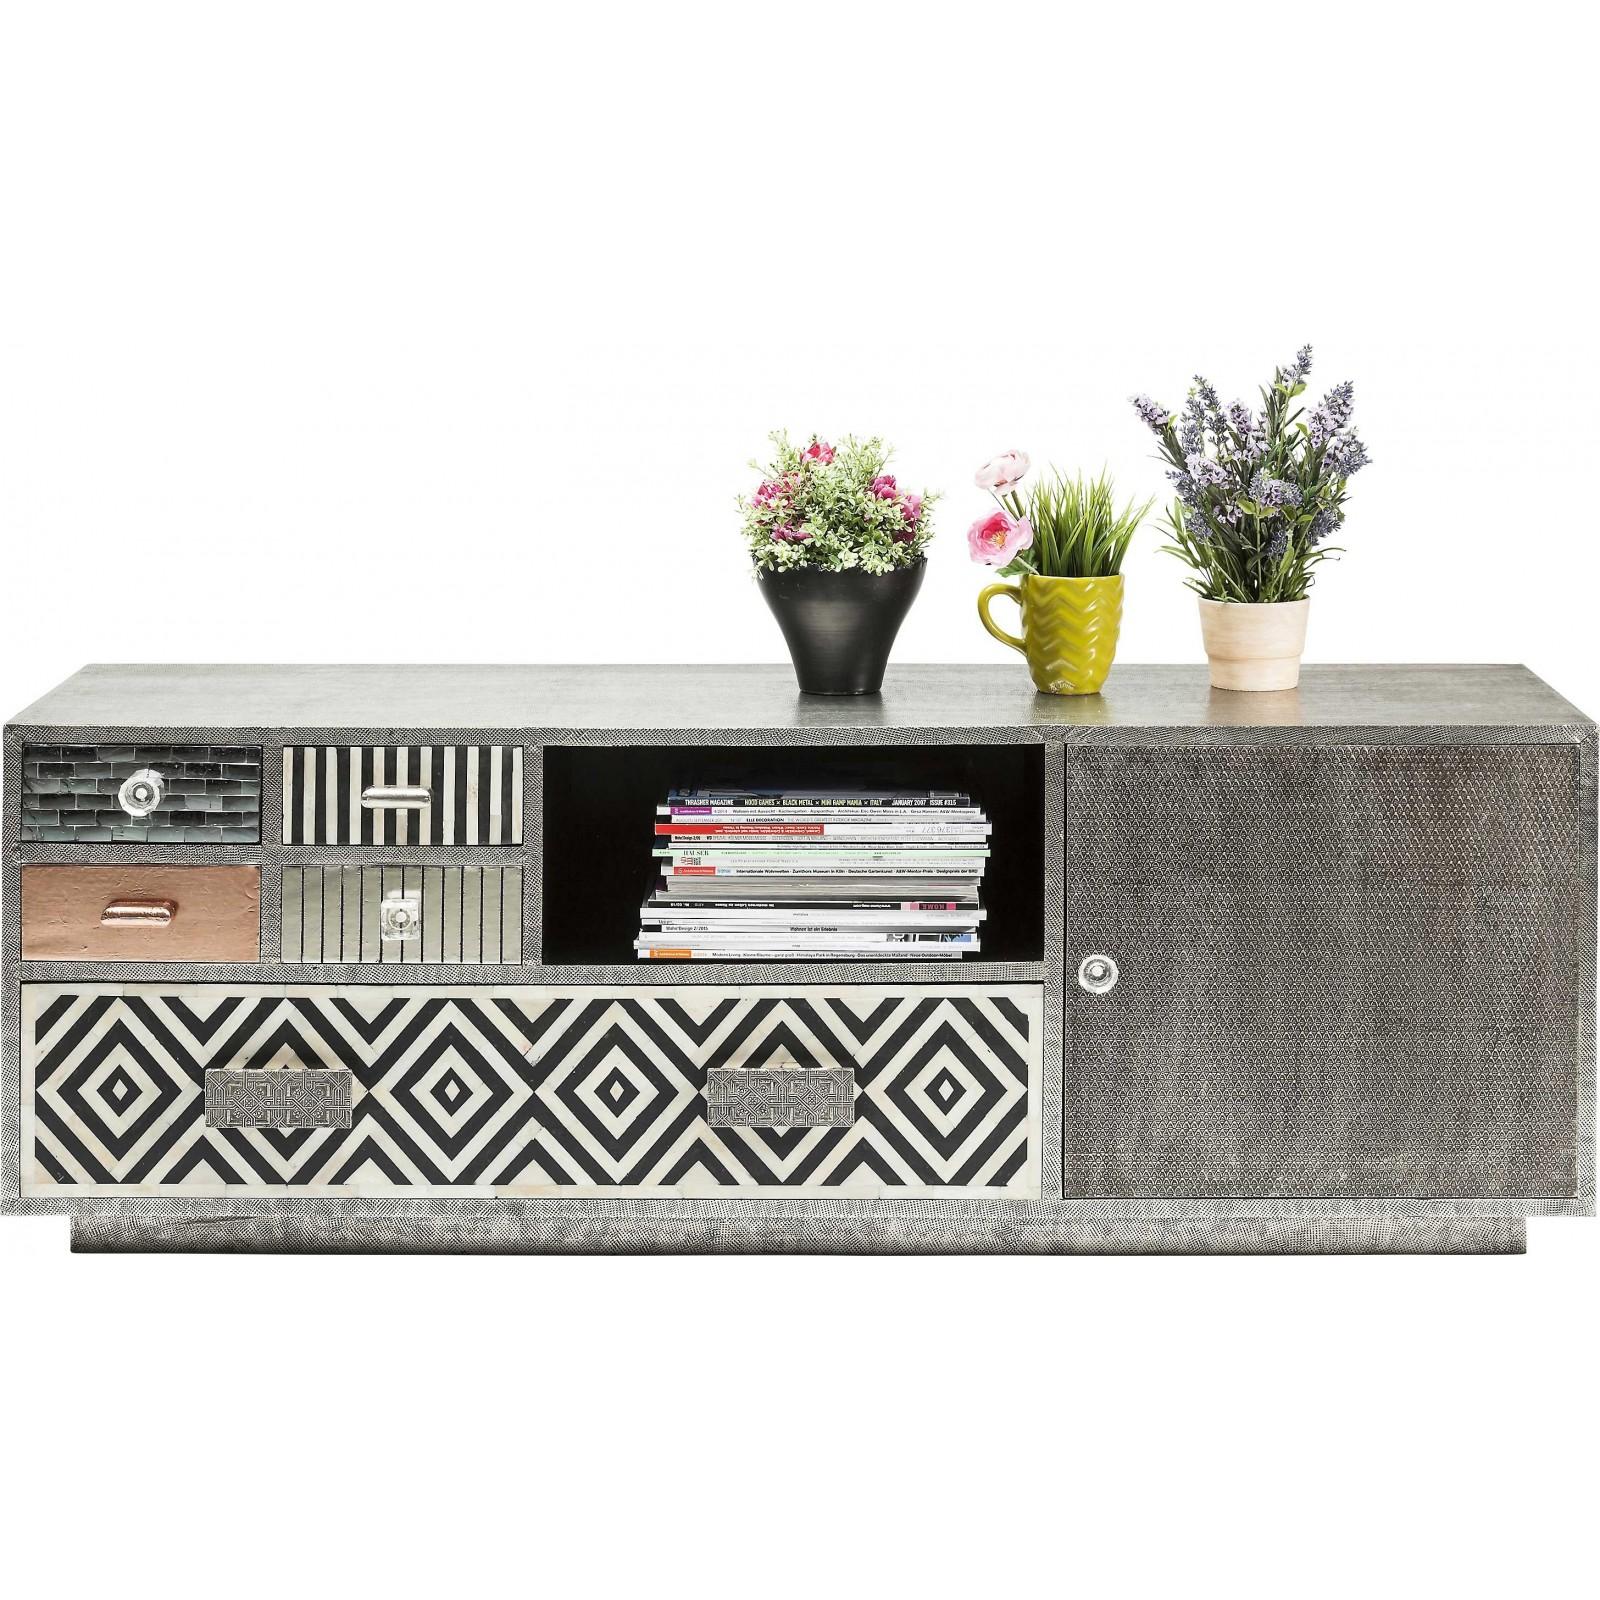 Meuble tv kare design mobilier design d coration d for Meuble tv yoop